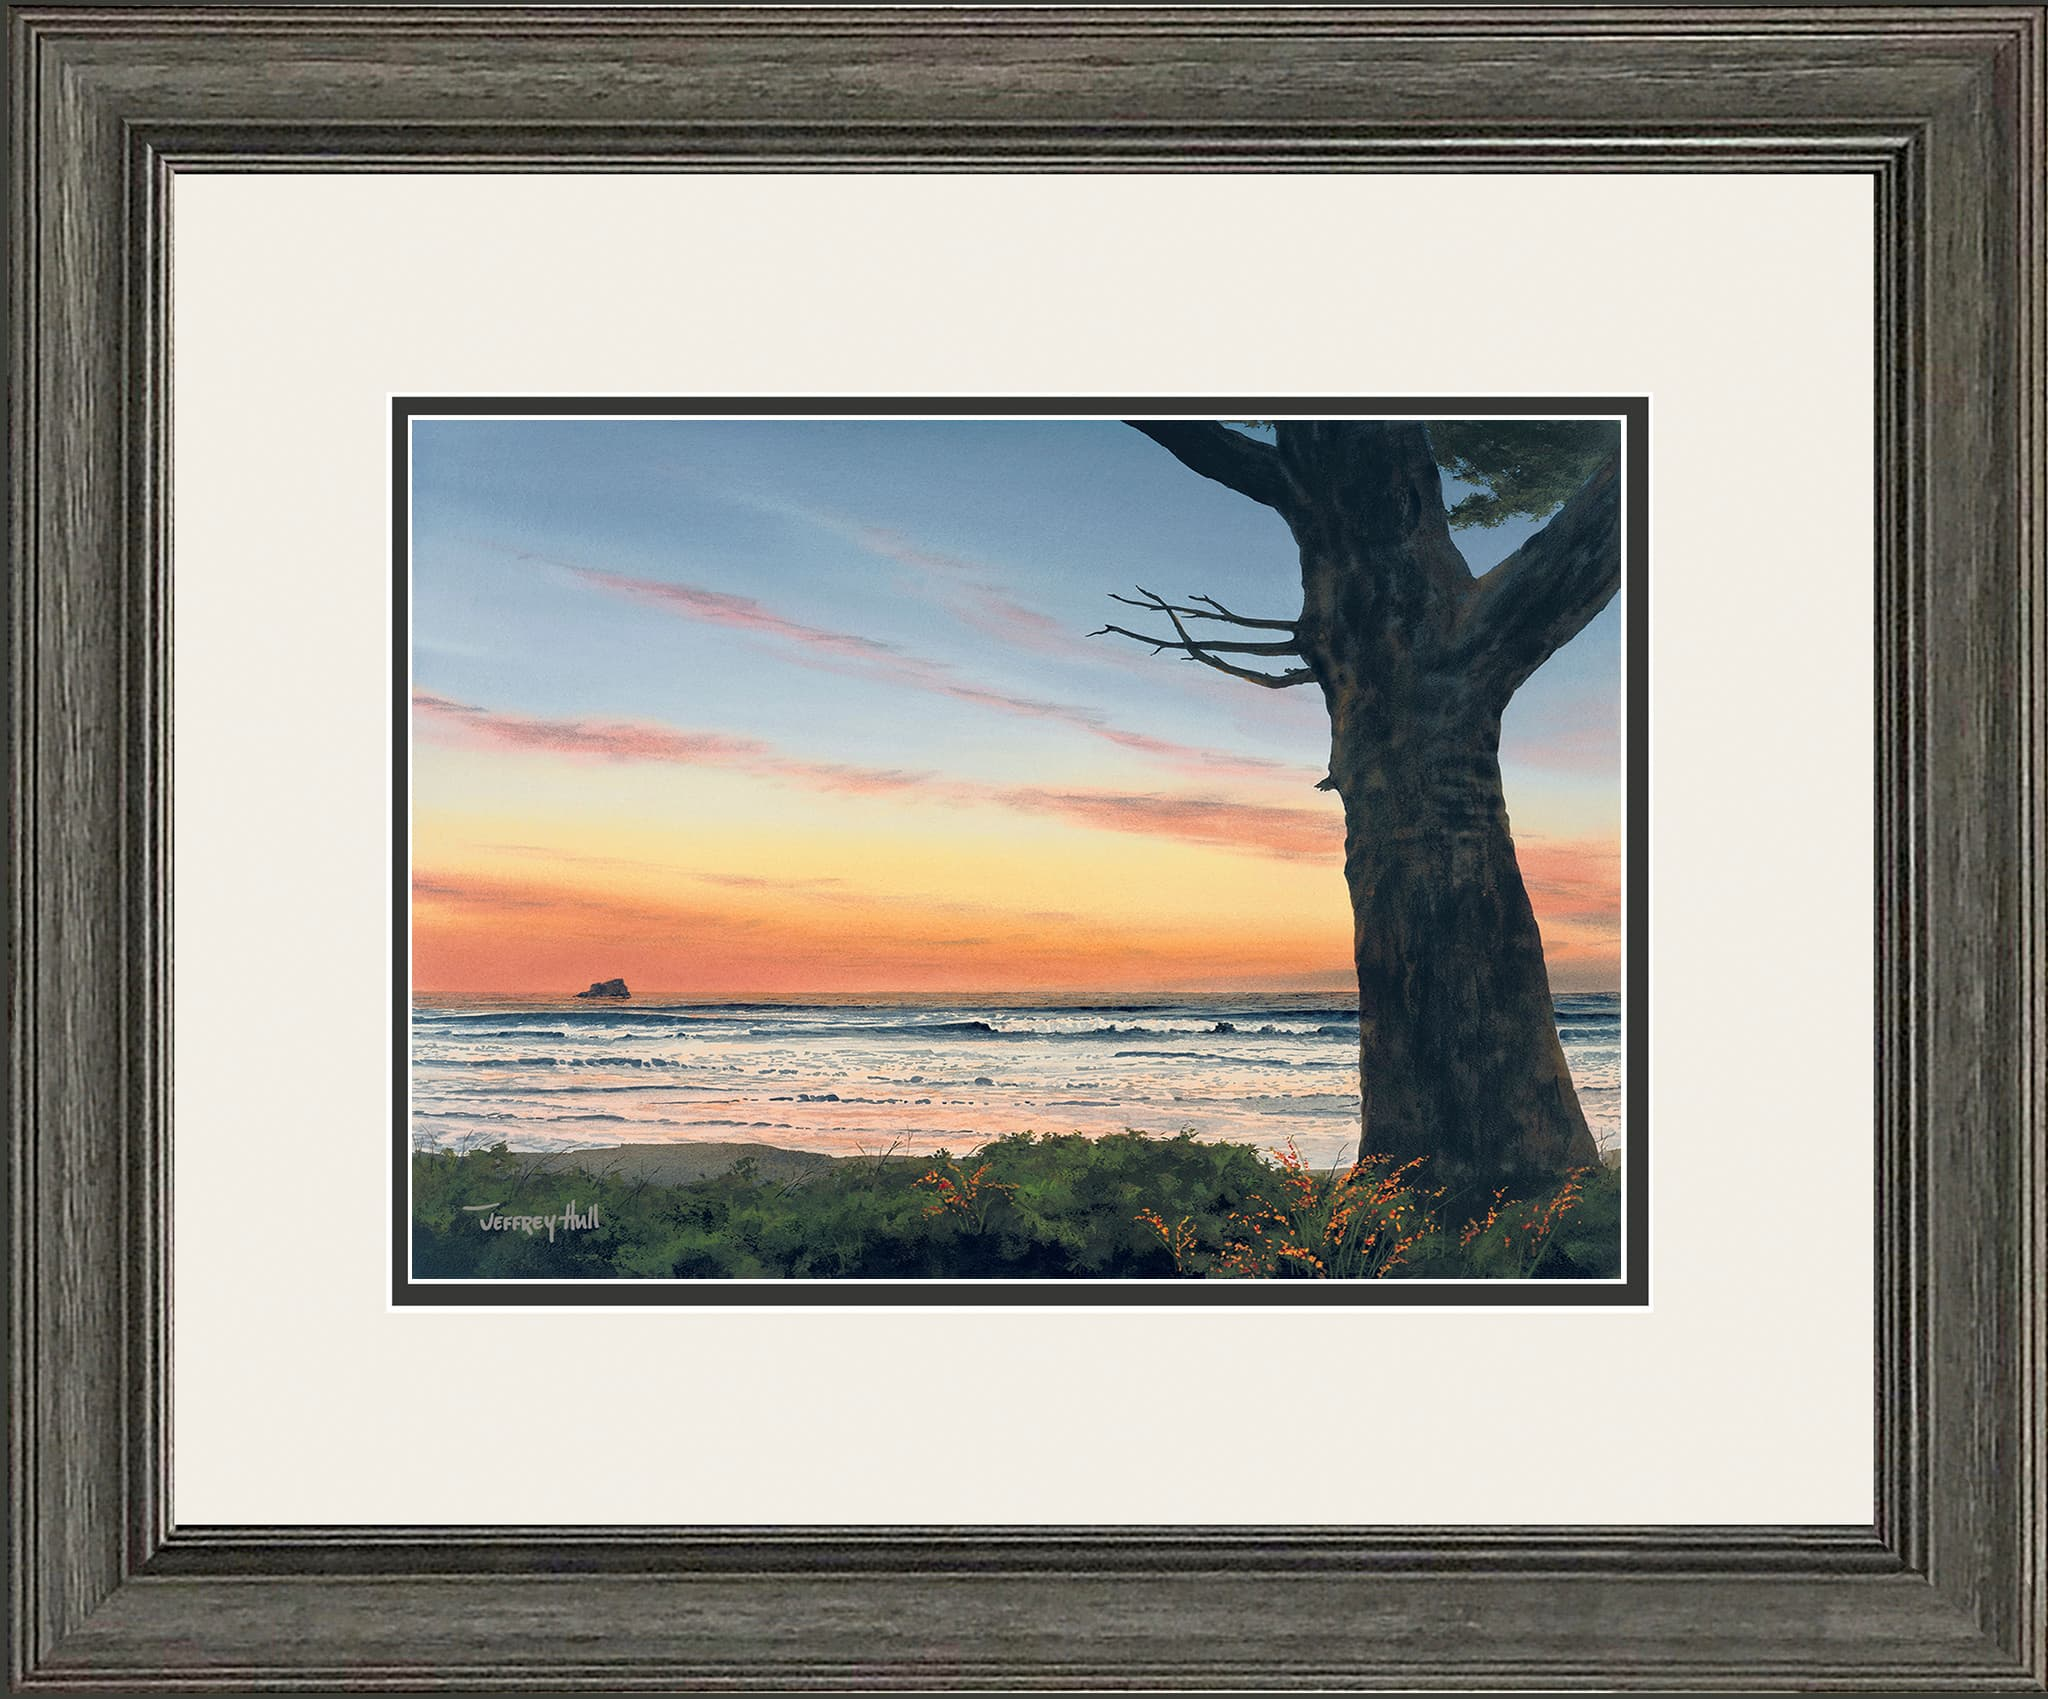 Sunset-Overlook-OpenEd-Cascade-Talc-Dark-Shale-4-Website-2021